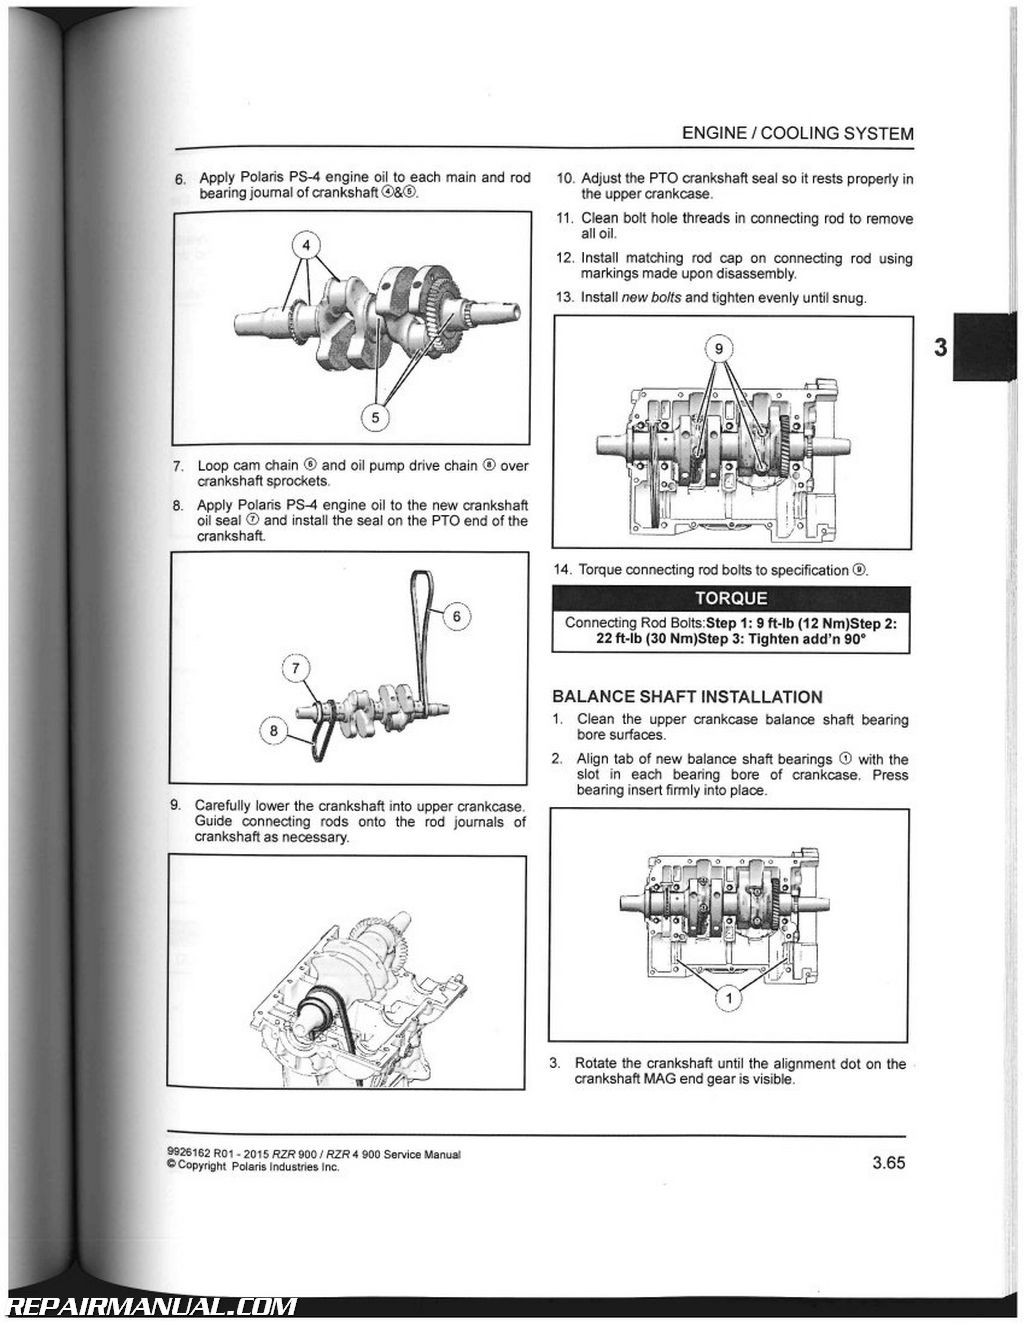 2013 Polaris Sportsman 550 Engine